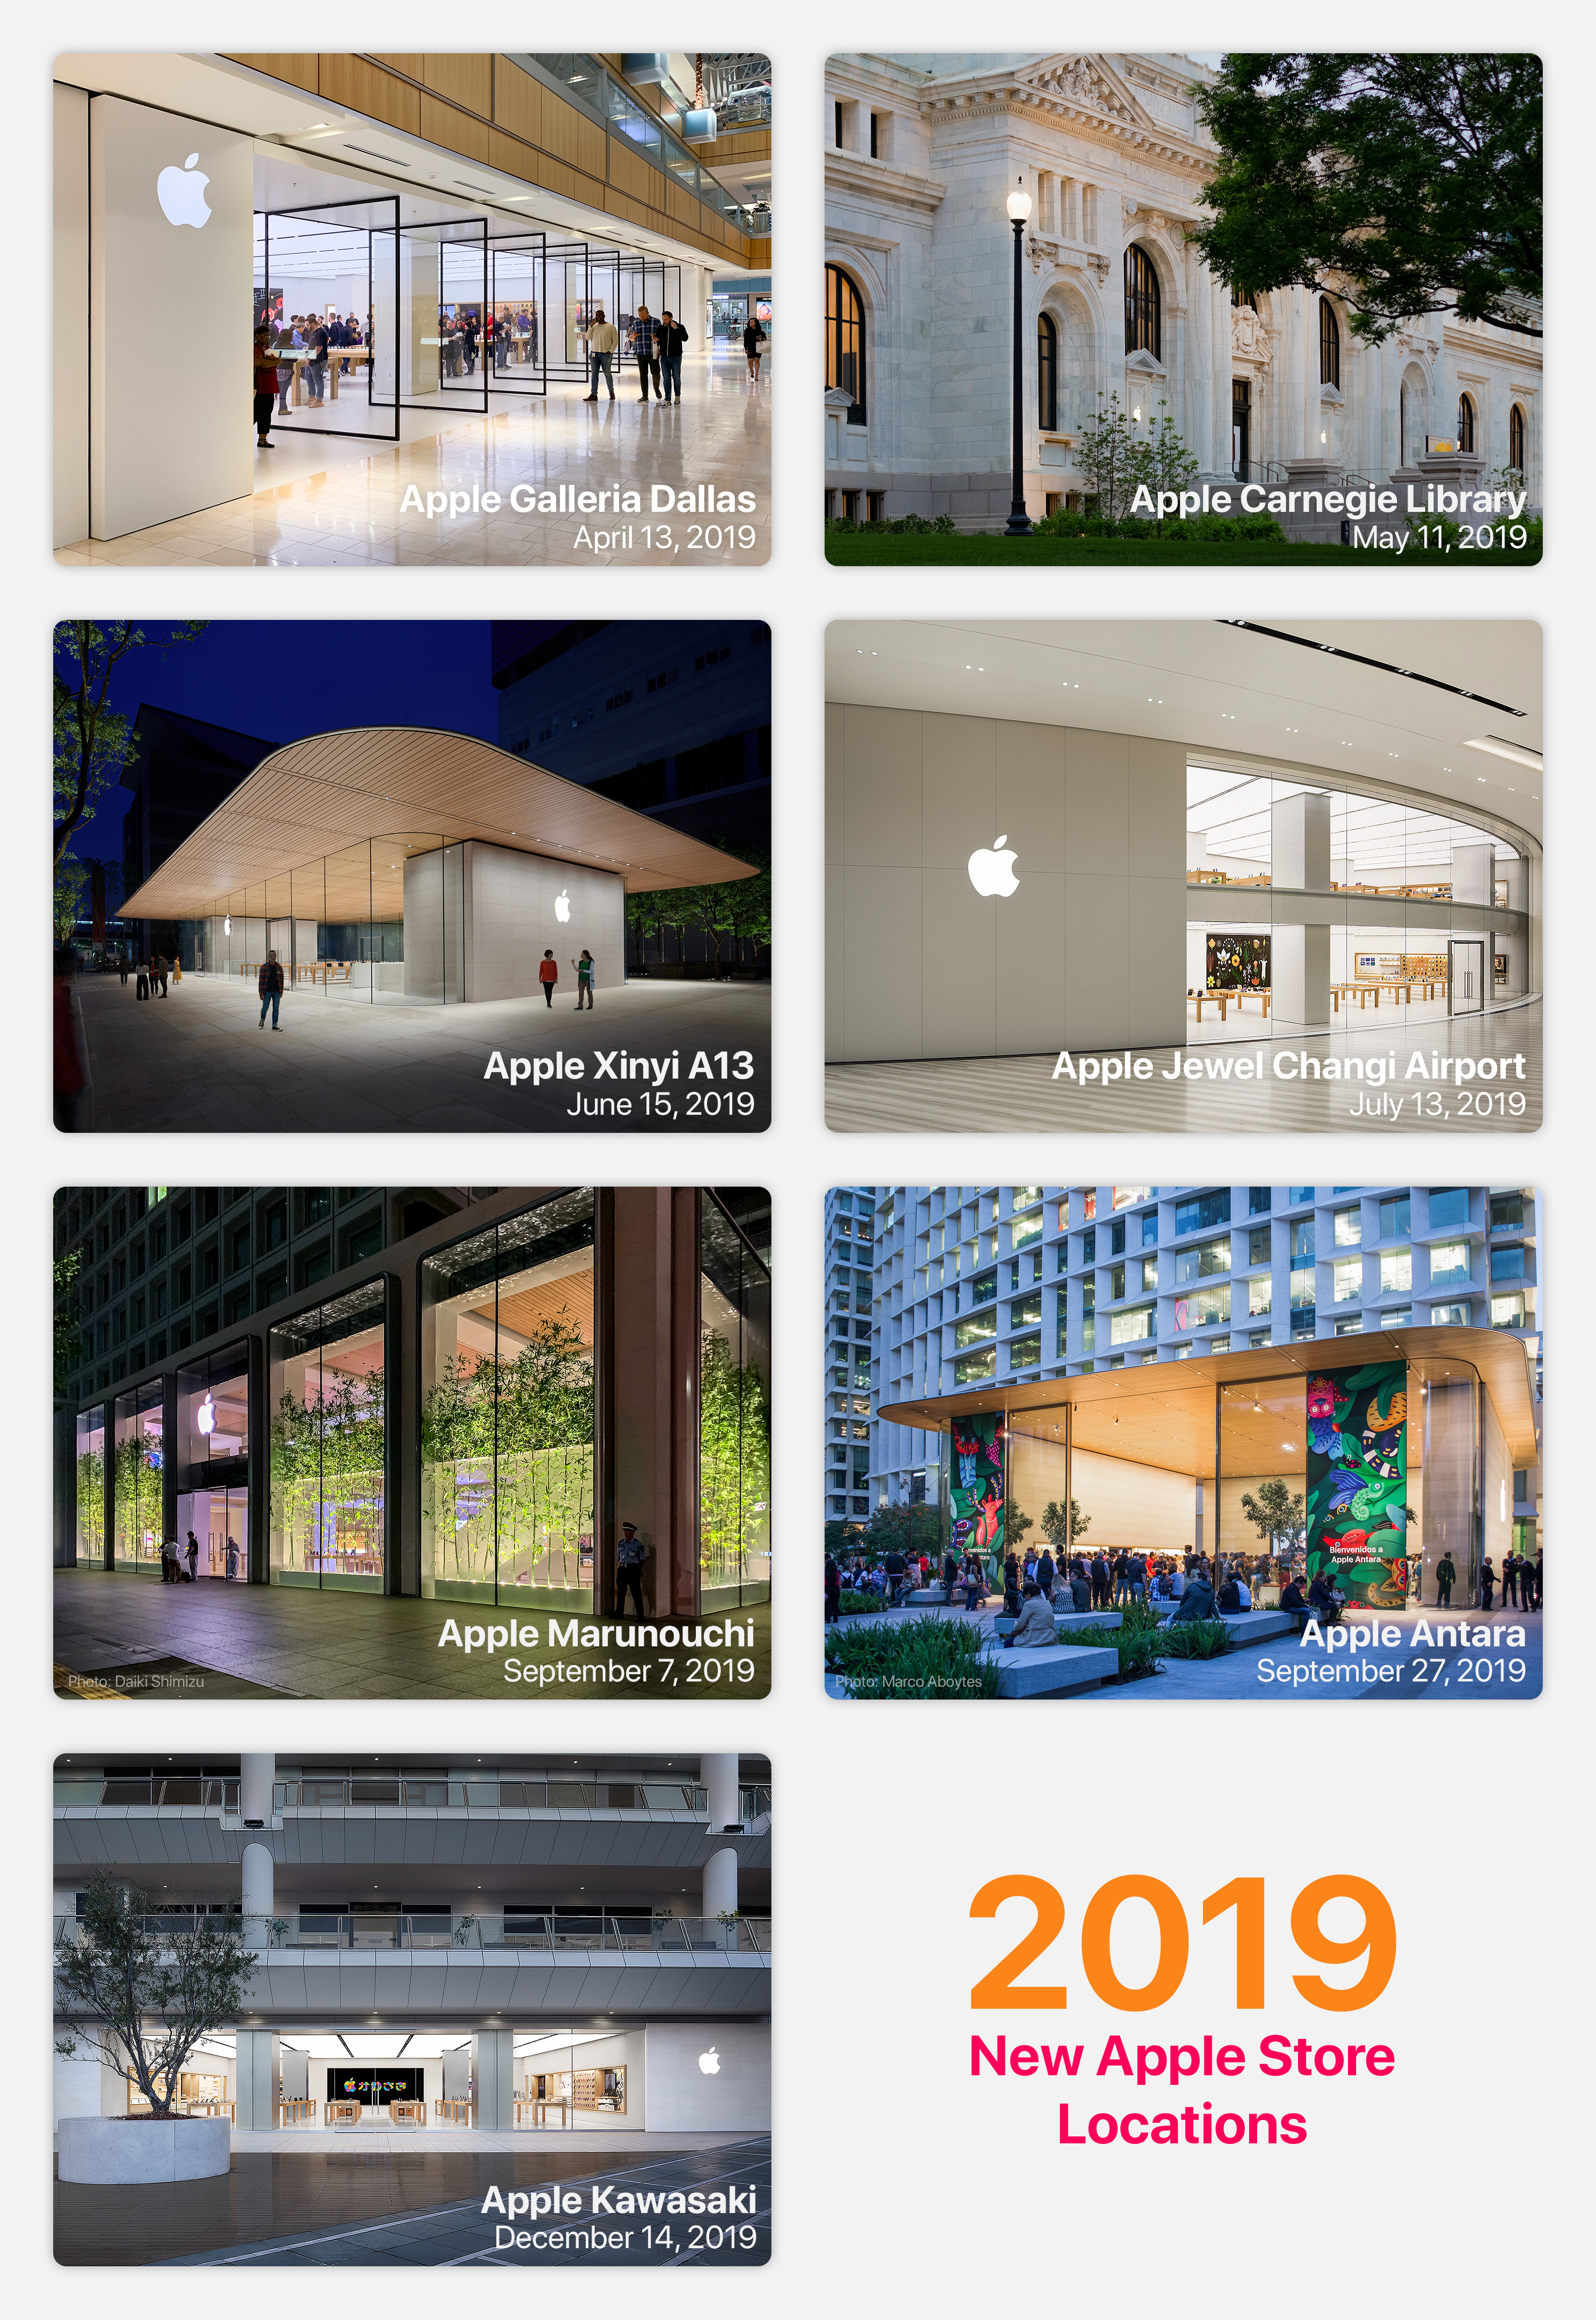 2019 New Apple Store Locations